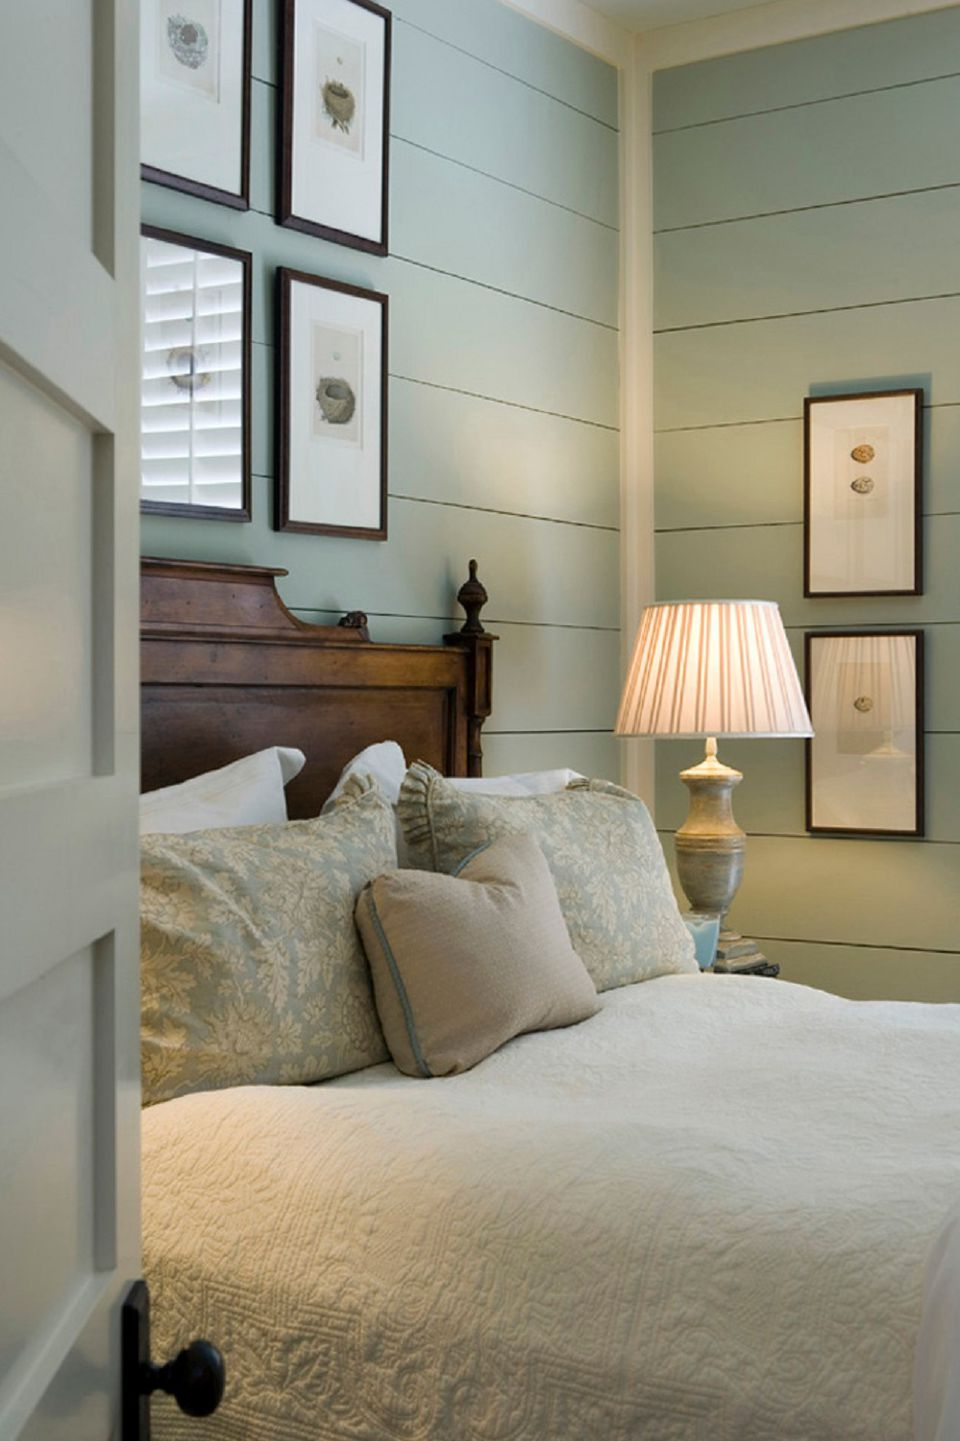 Bedroom with shiplap walls